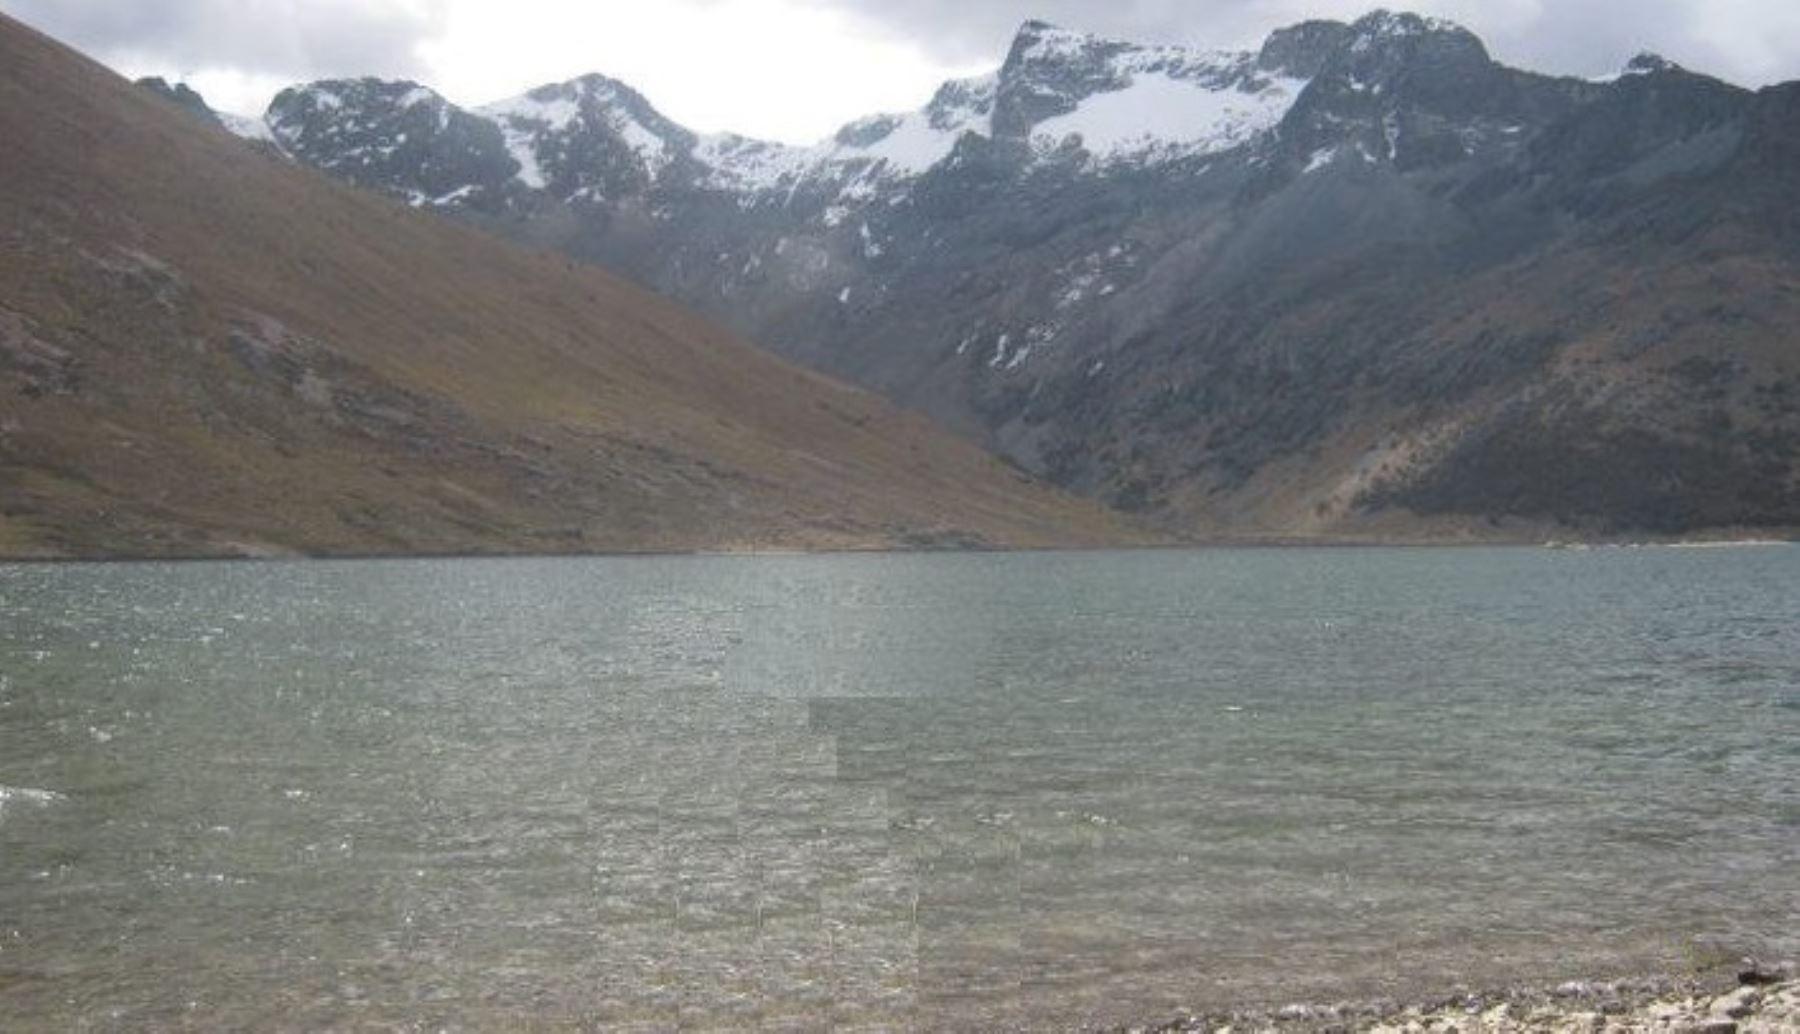 Yauyos: laguna Huancarcocha se encuentra en peligro latente de desborde. Foto: Portal Yauyos.